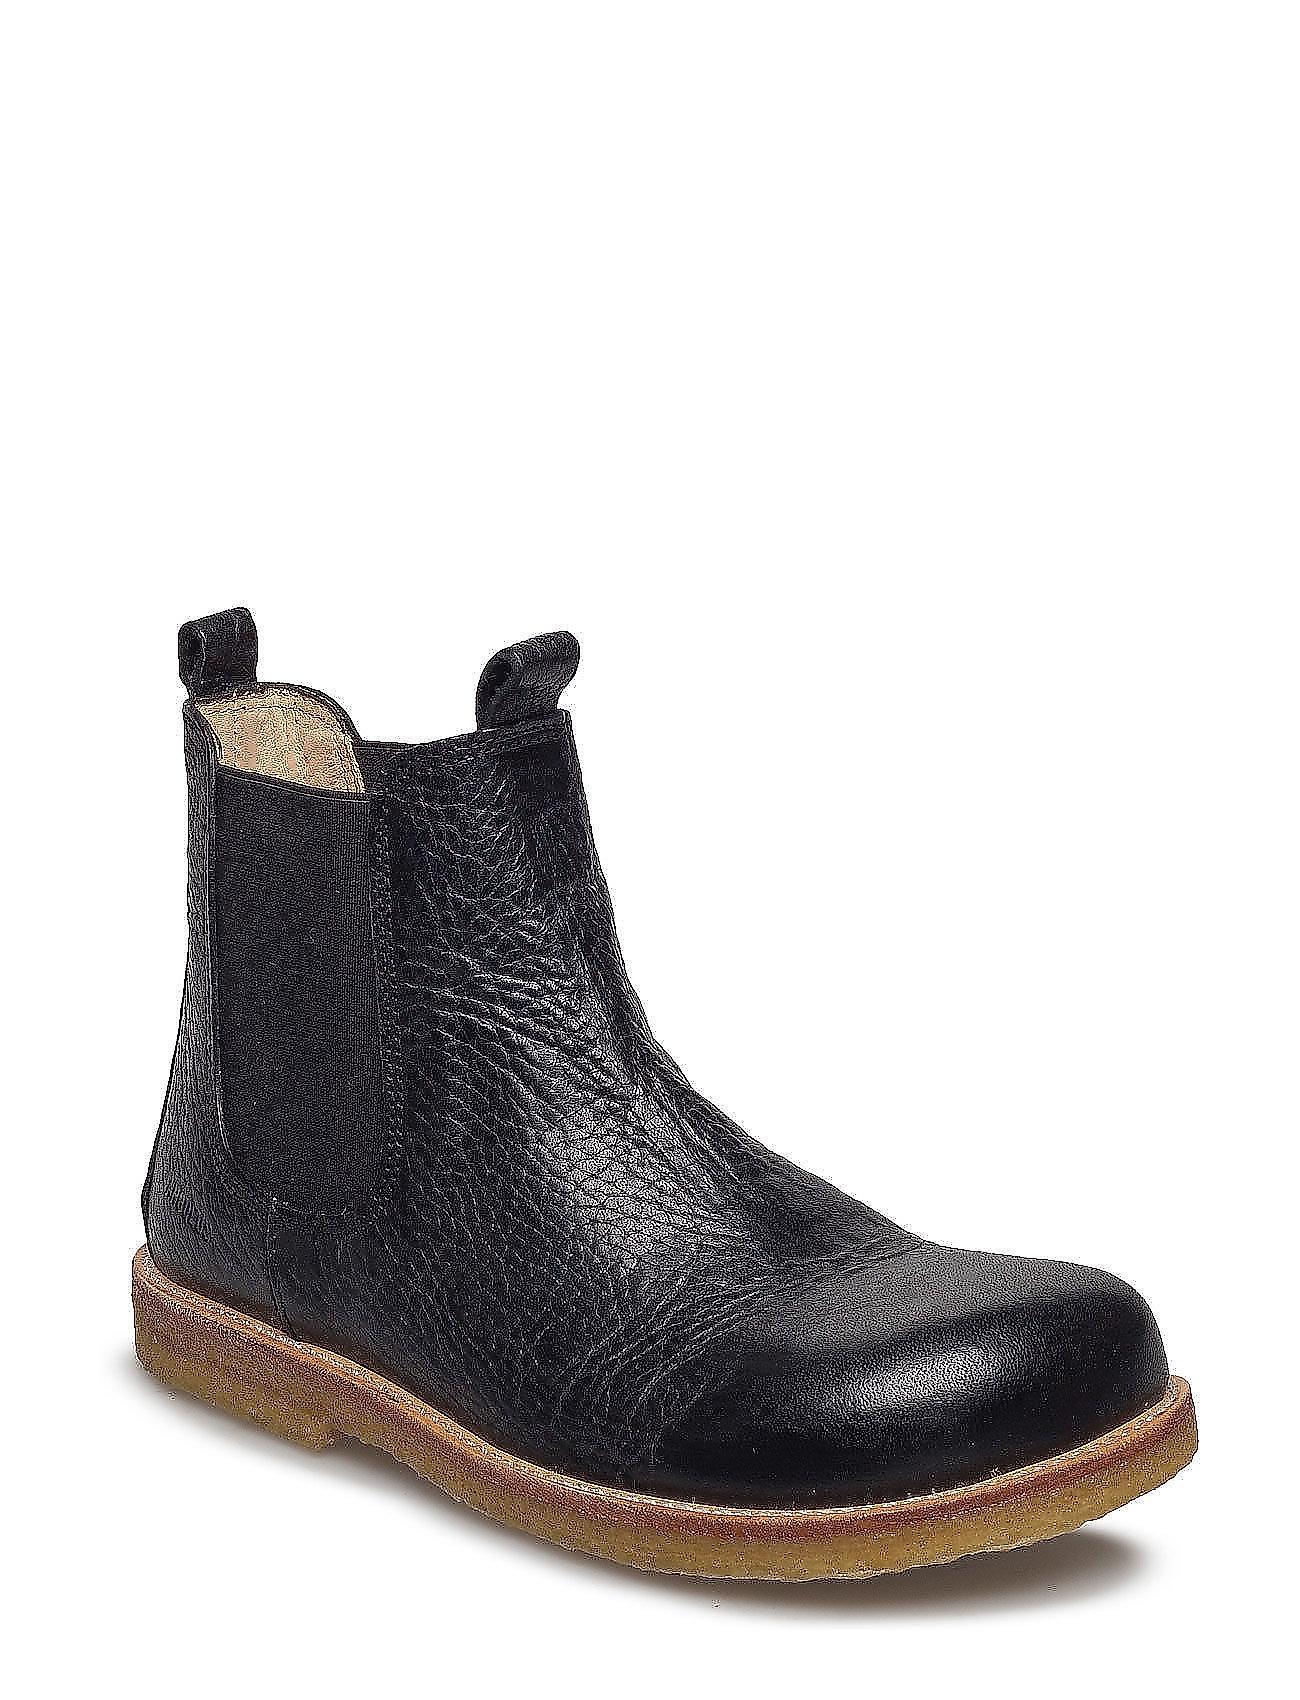 ANGULUS Chelsea boot - 1933/001 BLACK/BLACK